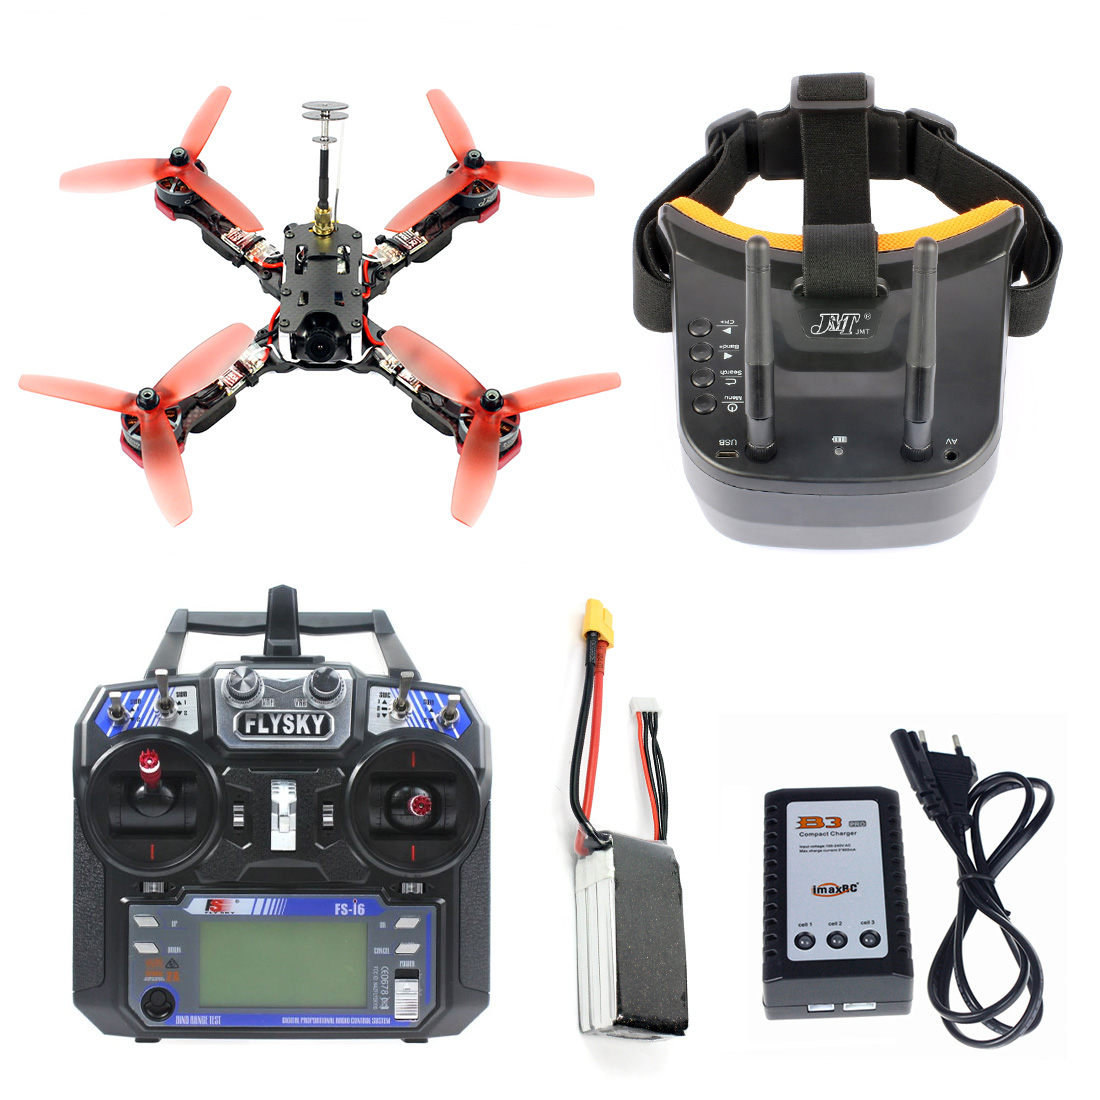 Grenouille 218mm 2.4G 6CH RC Racer Drone RTF Betaflight F4 Pro V2 BLHeli-s 30A 5.8G 25/200/400 mW VTX Mini 700TVL caméra FPV quadrirotor